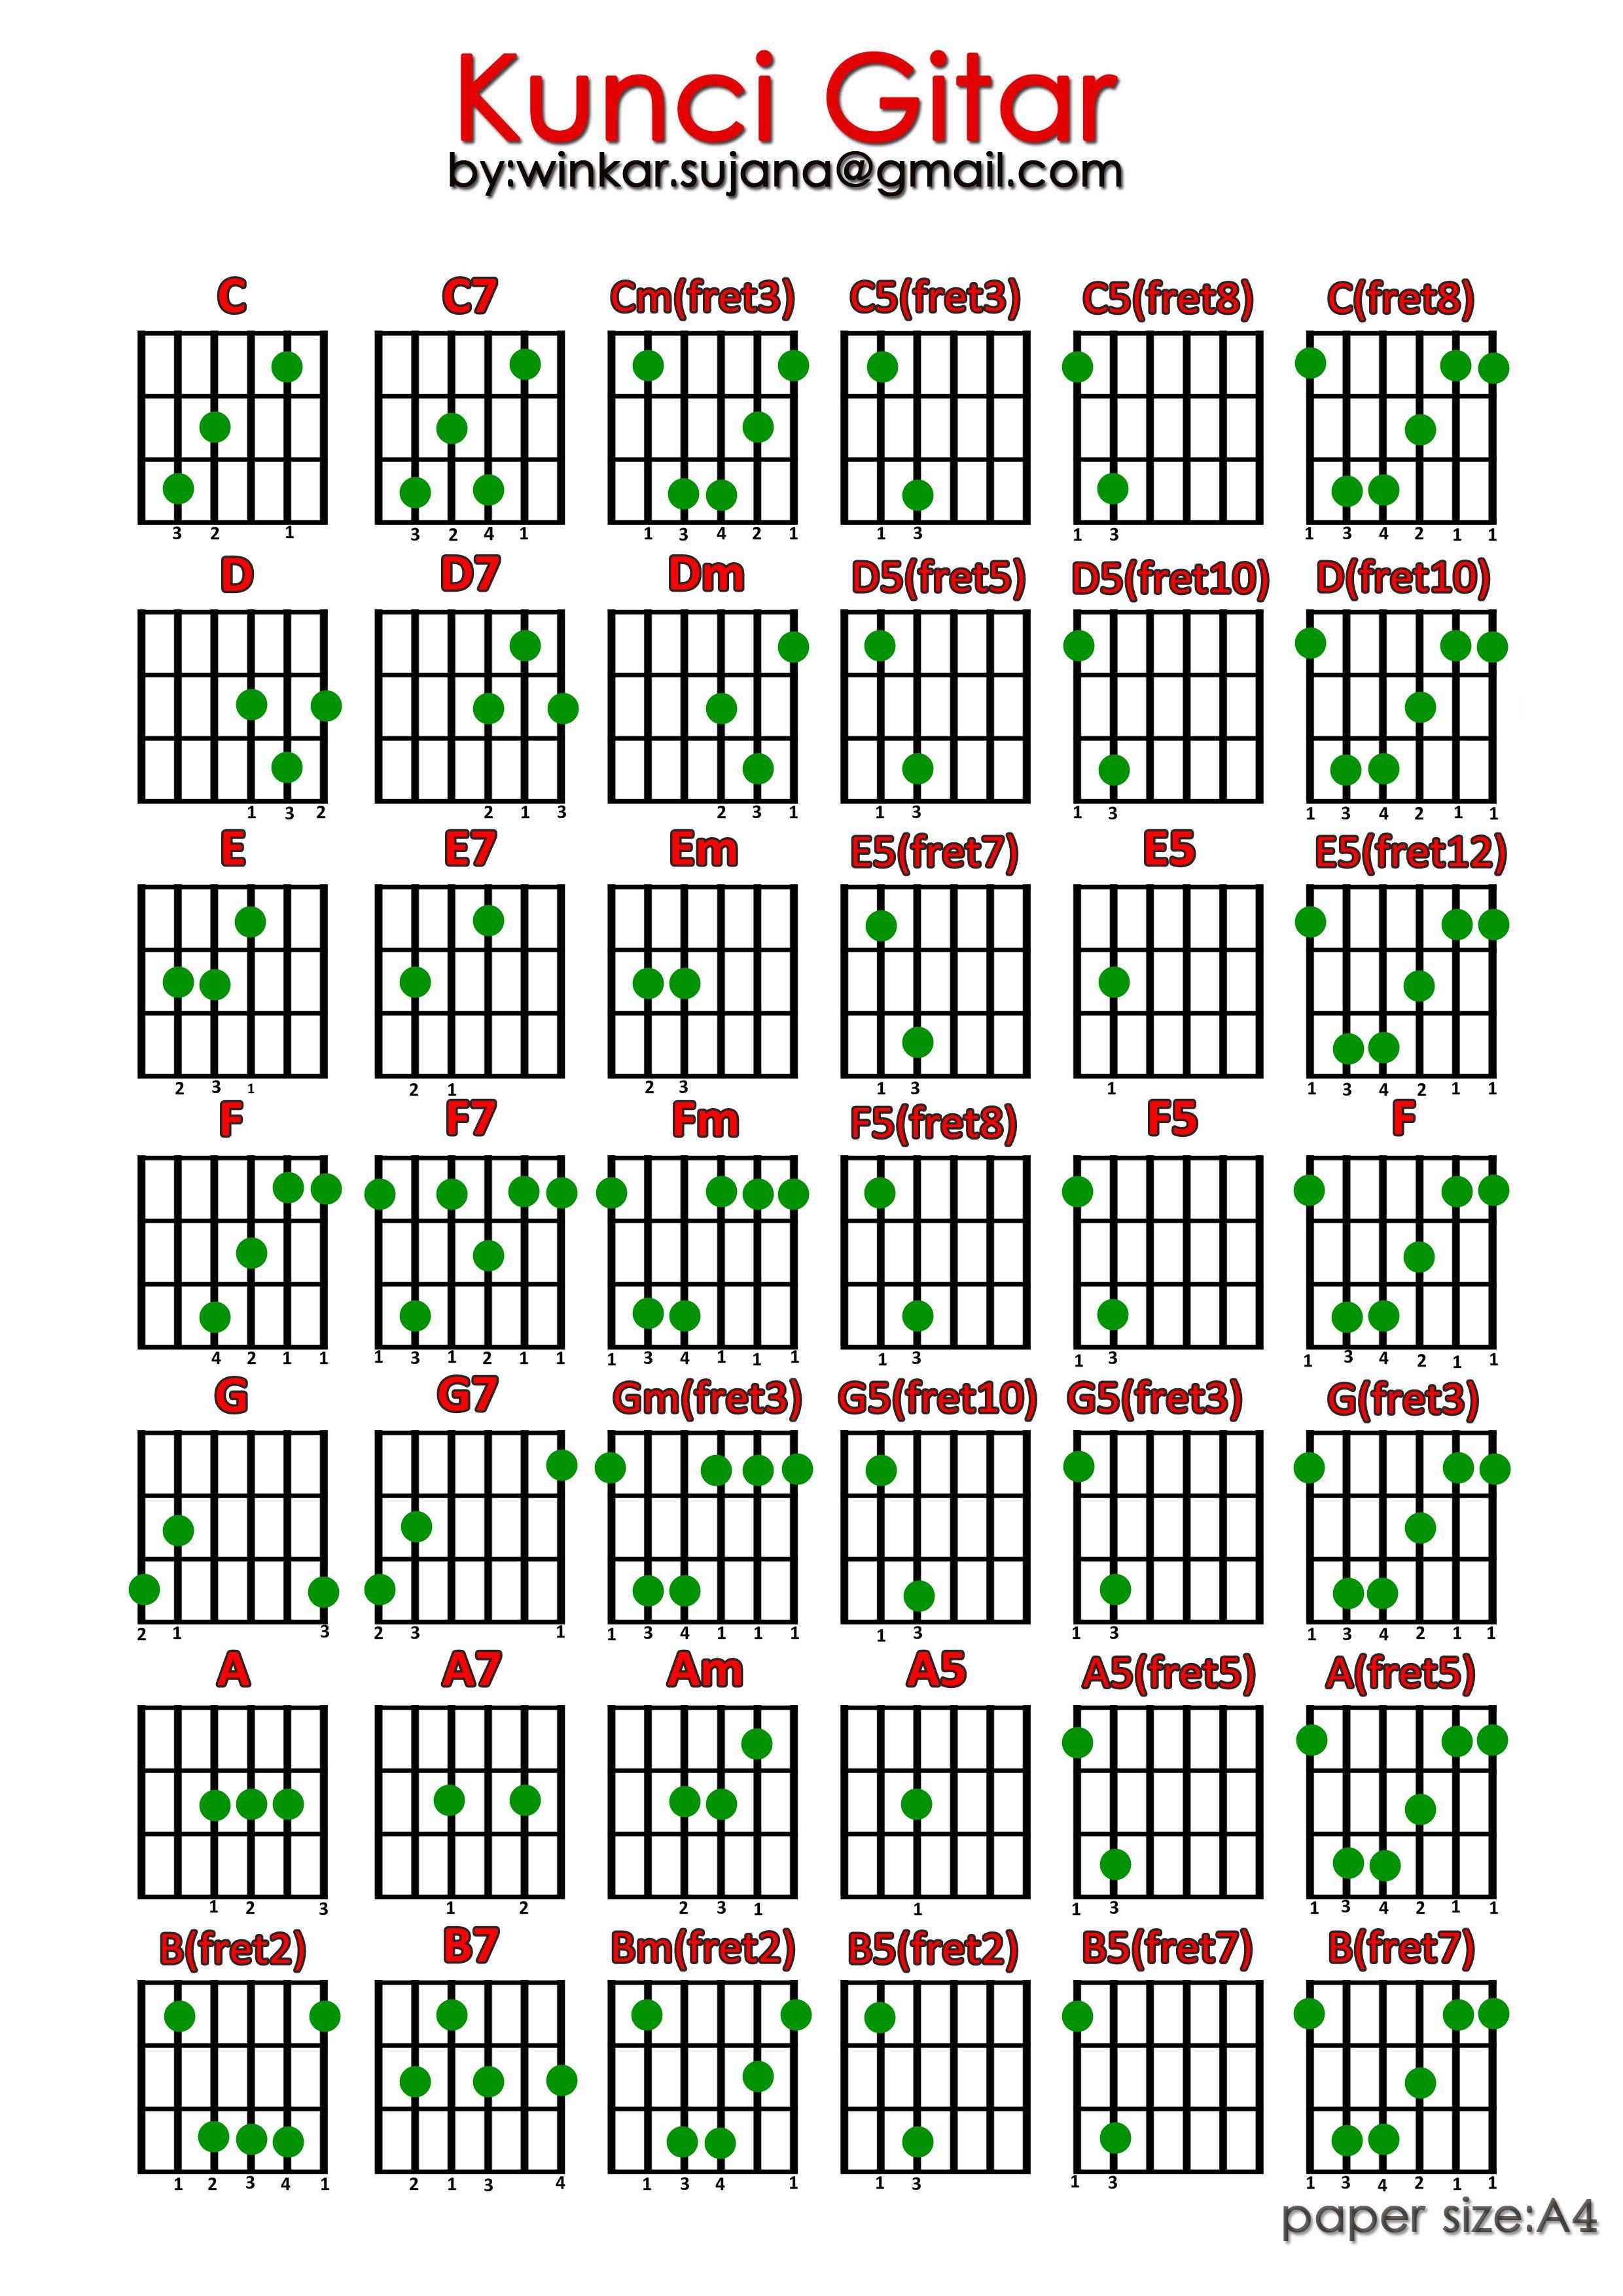 Kunci Gitar  newhairstylesformen2014com